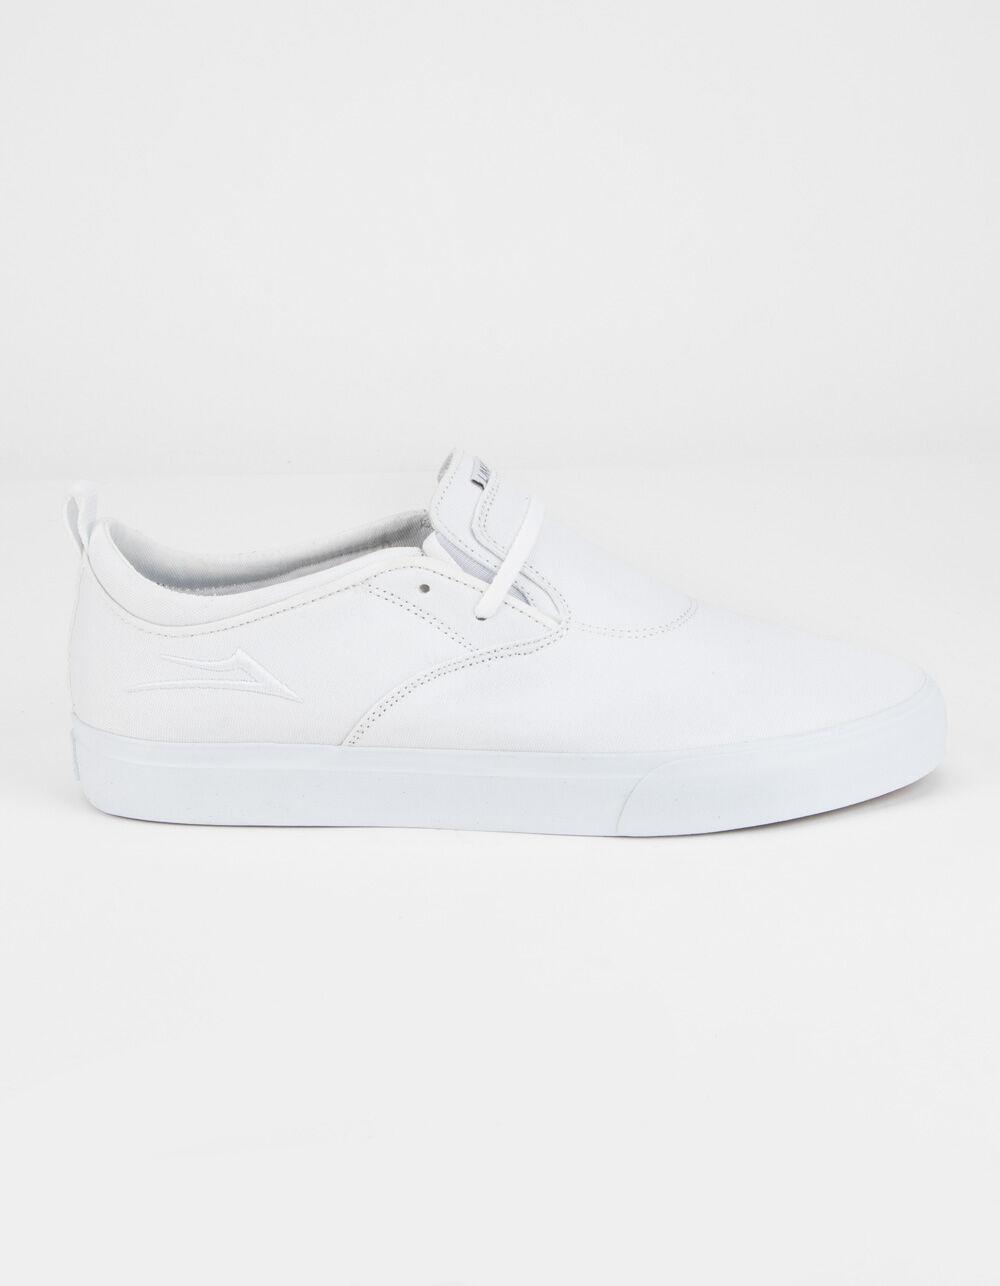 LAKAI Riley Hawk 2 White Canvas Shoes